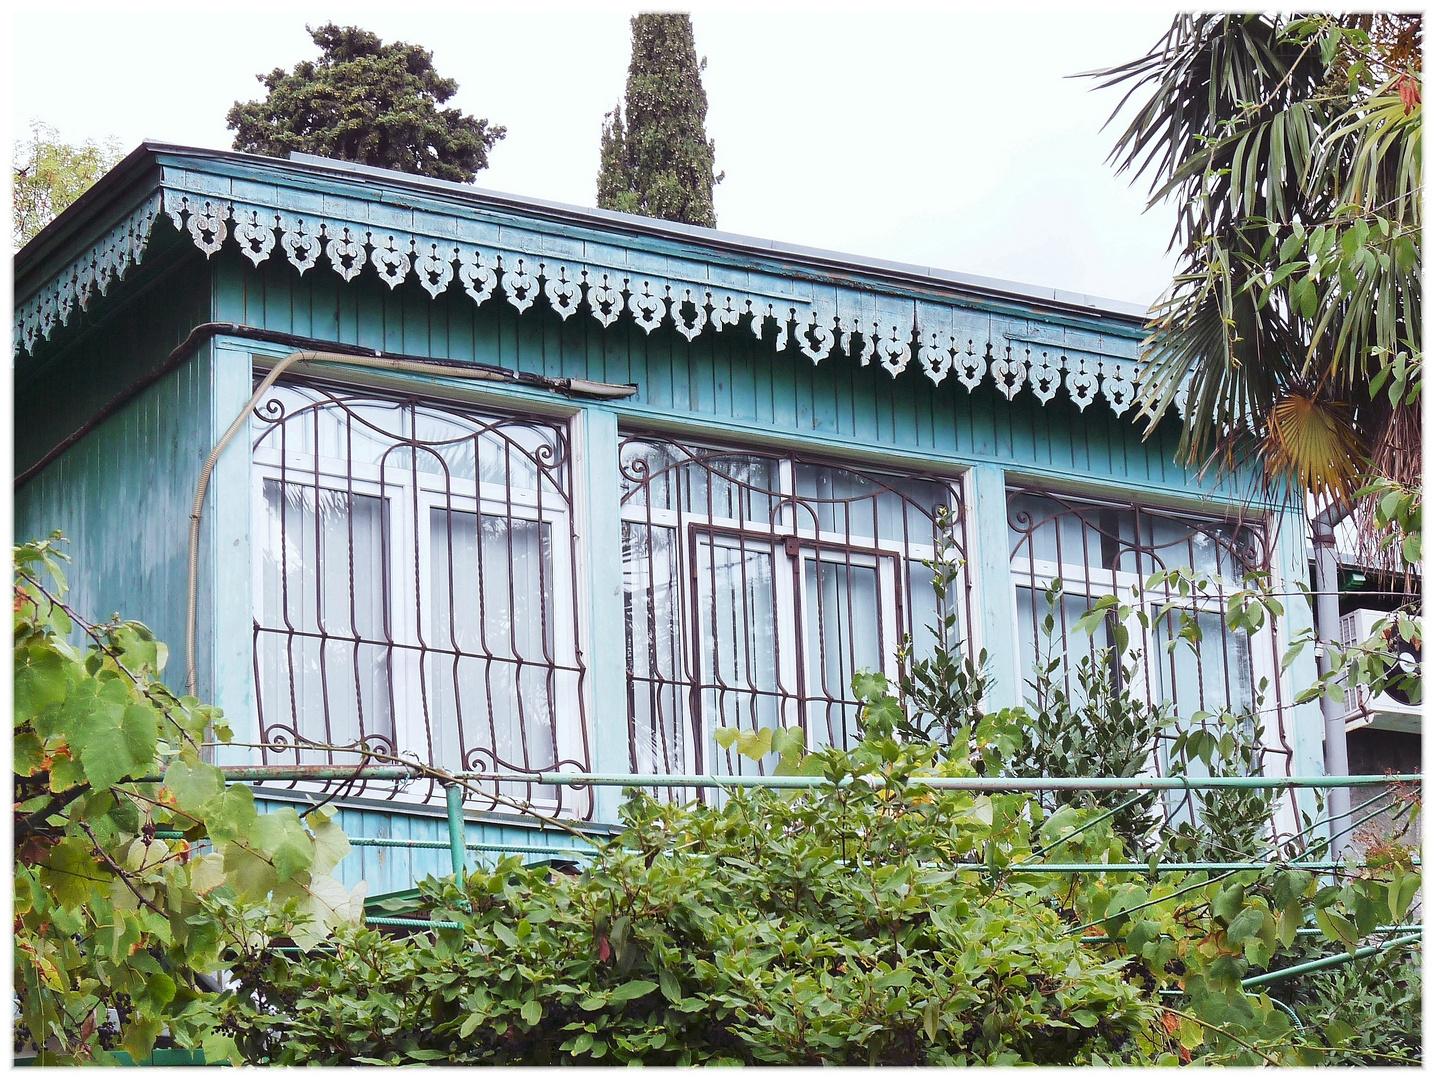 Krim-Tataren-Architektur